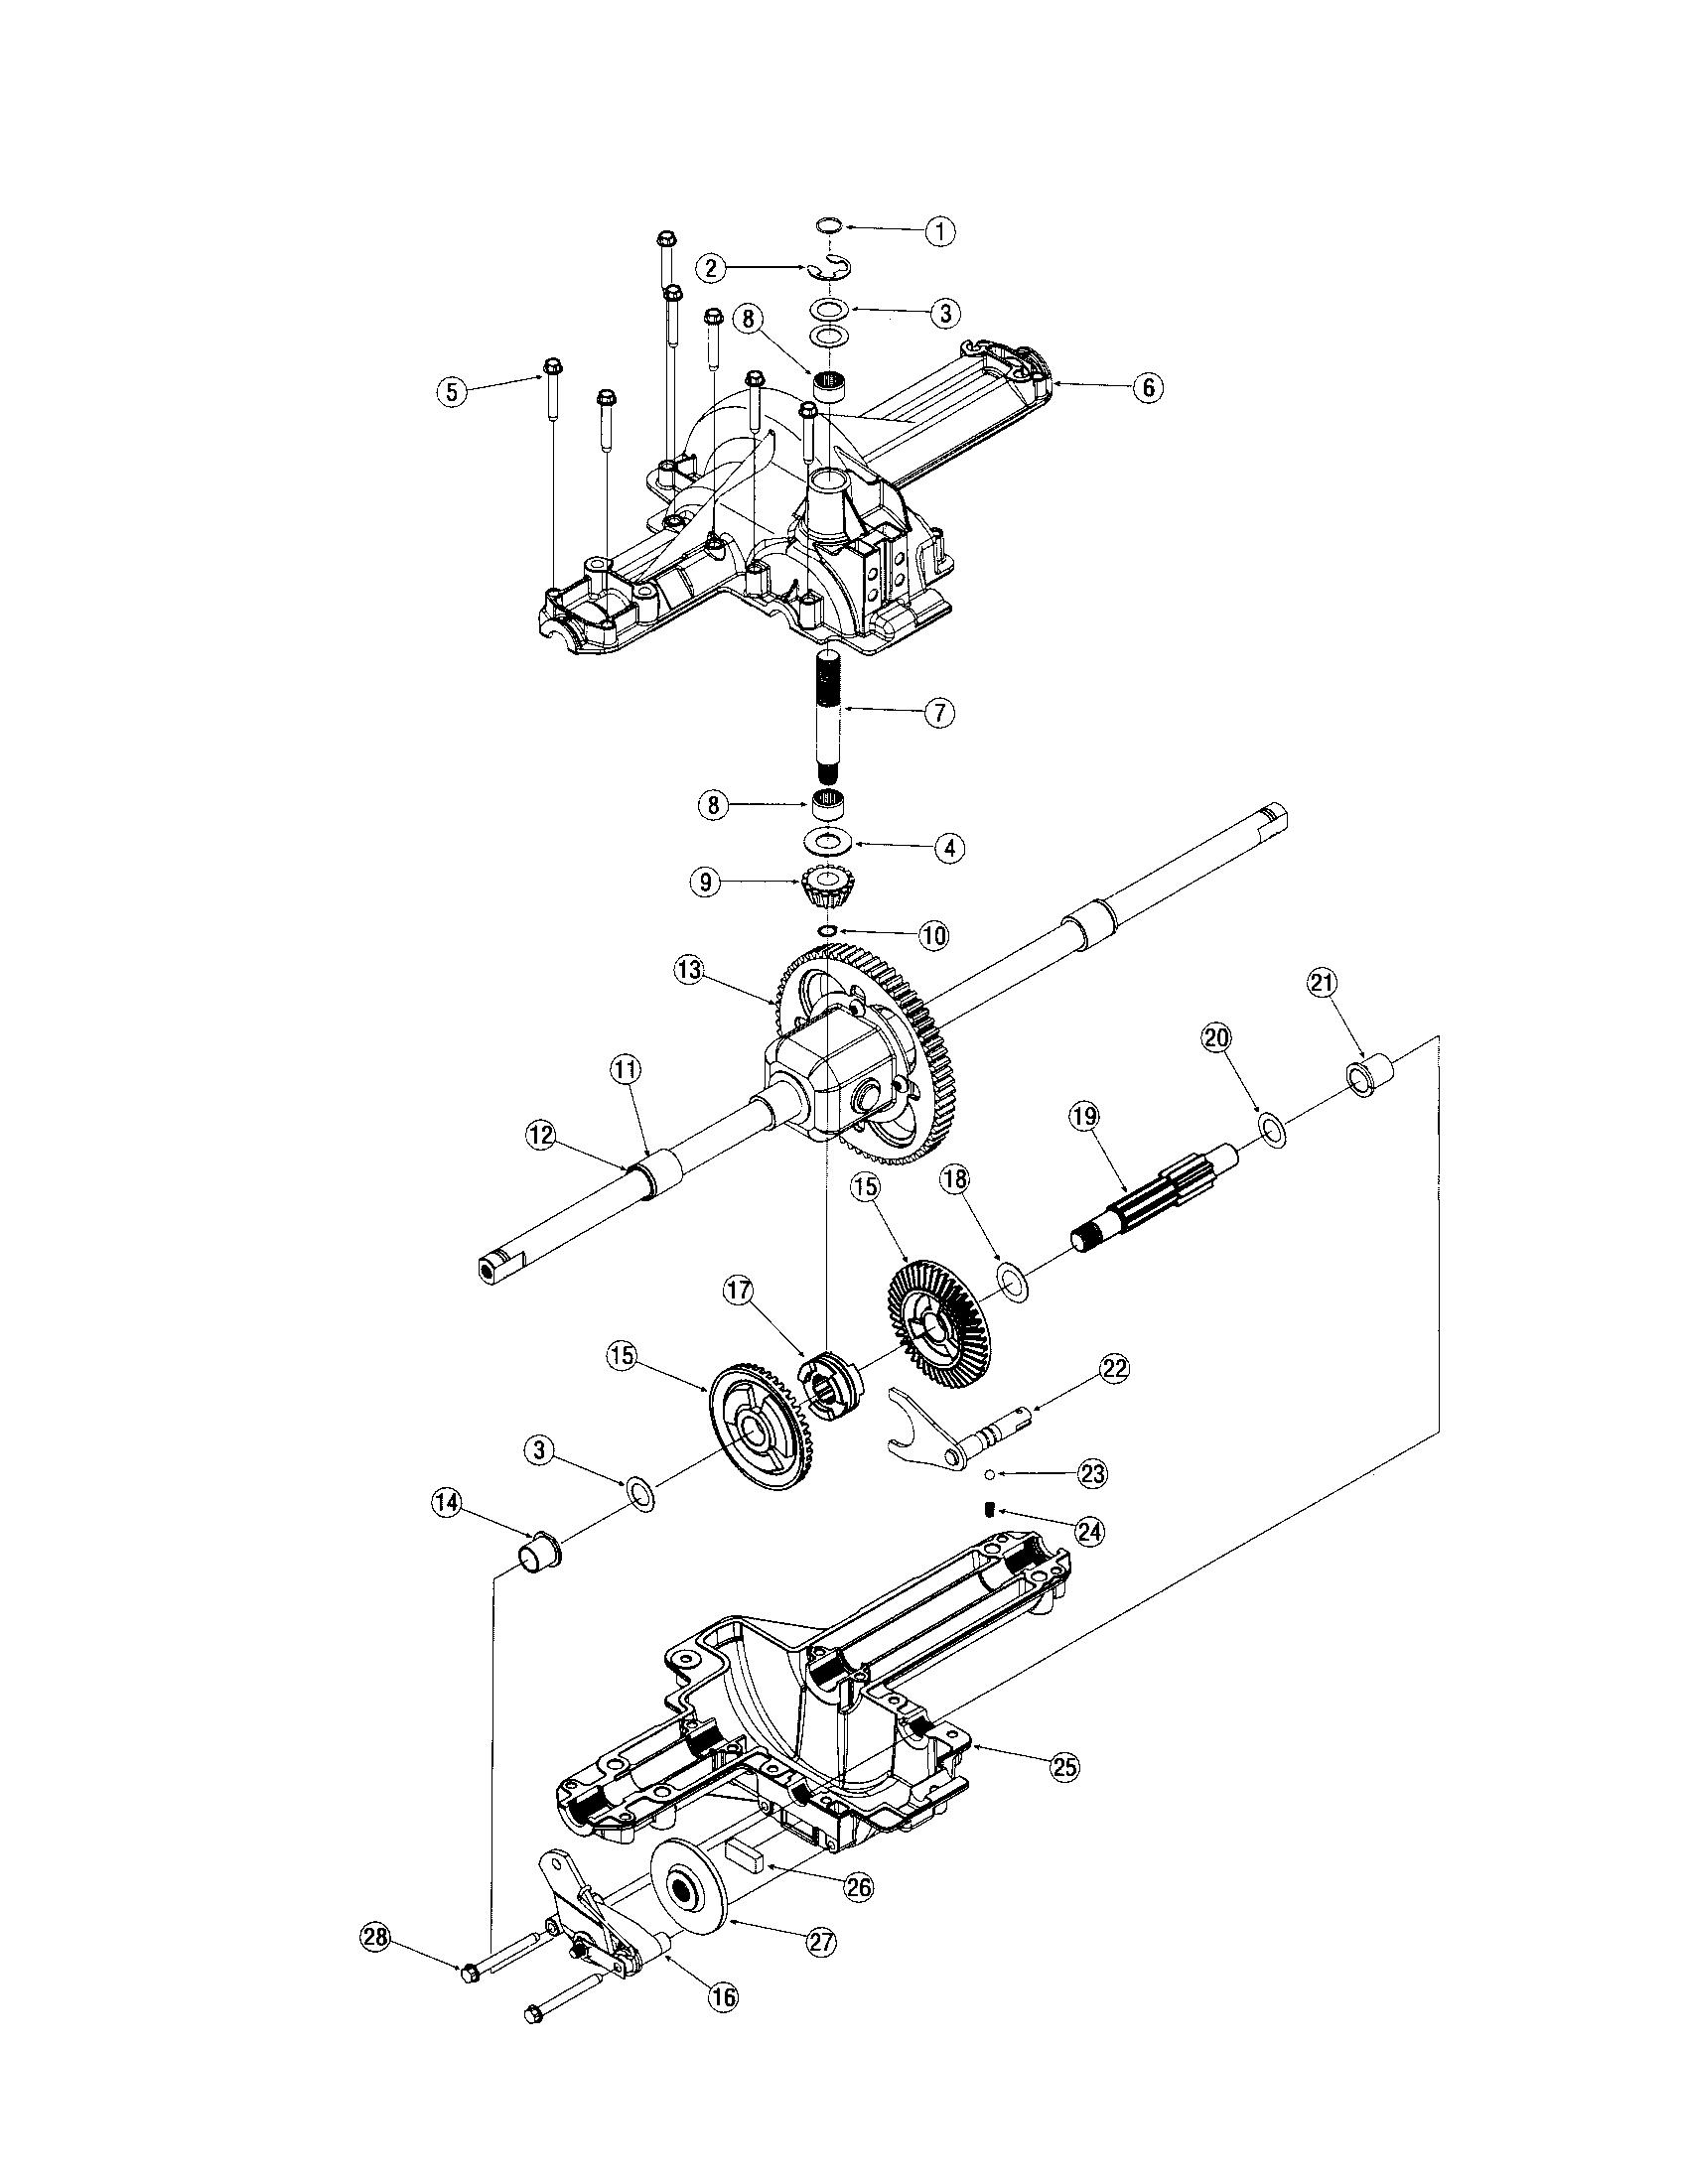 toro lx420 wiring diagram